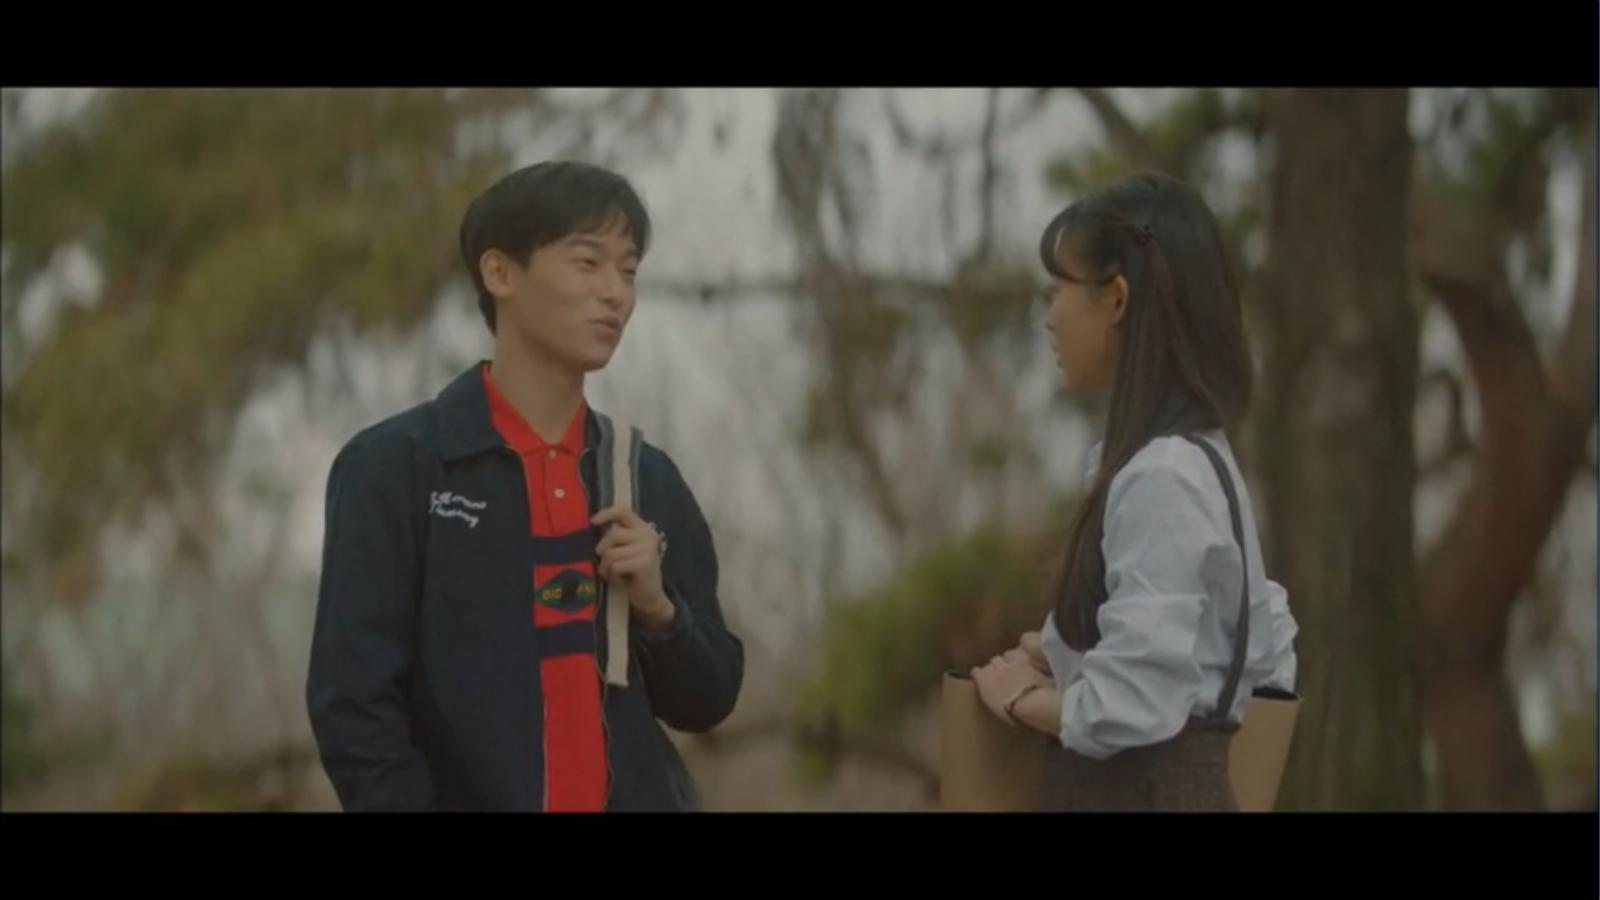 When My Love Blooms Episode 2 Yoon Ji-soo and Joo Young-woo talking